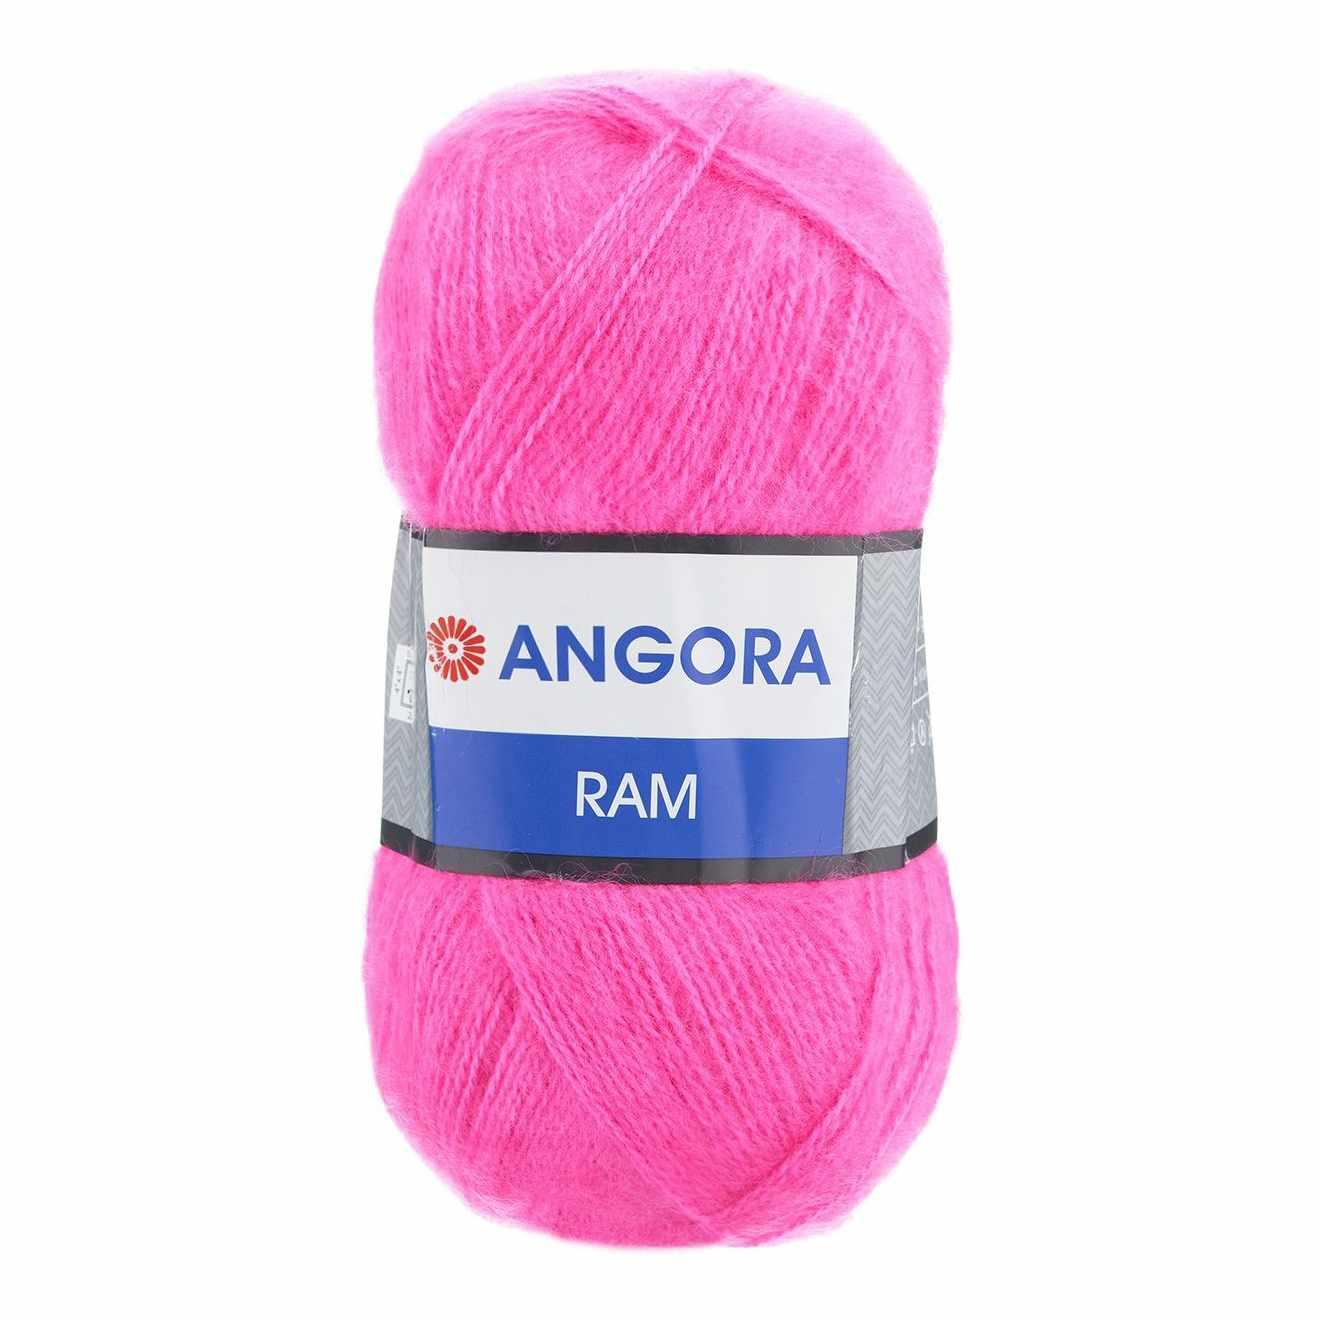 Пряжа YarnArt Angora Ram Цвет.174 Розовый неон